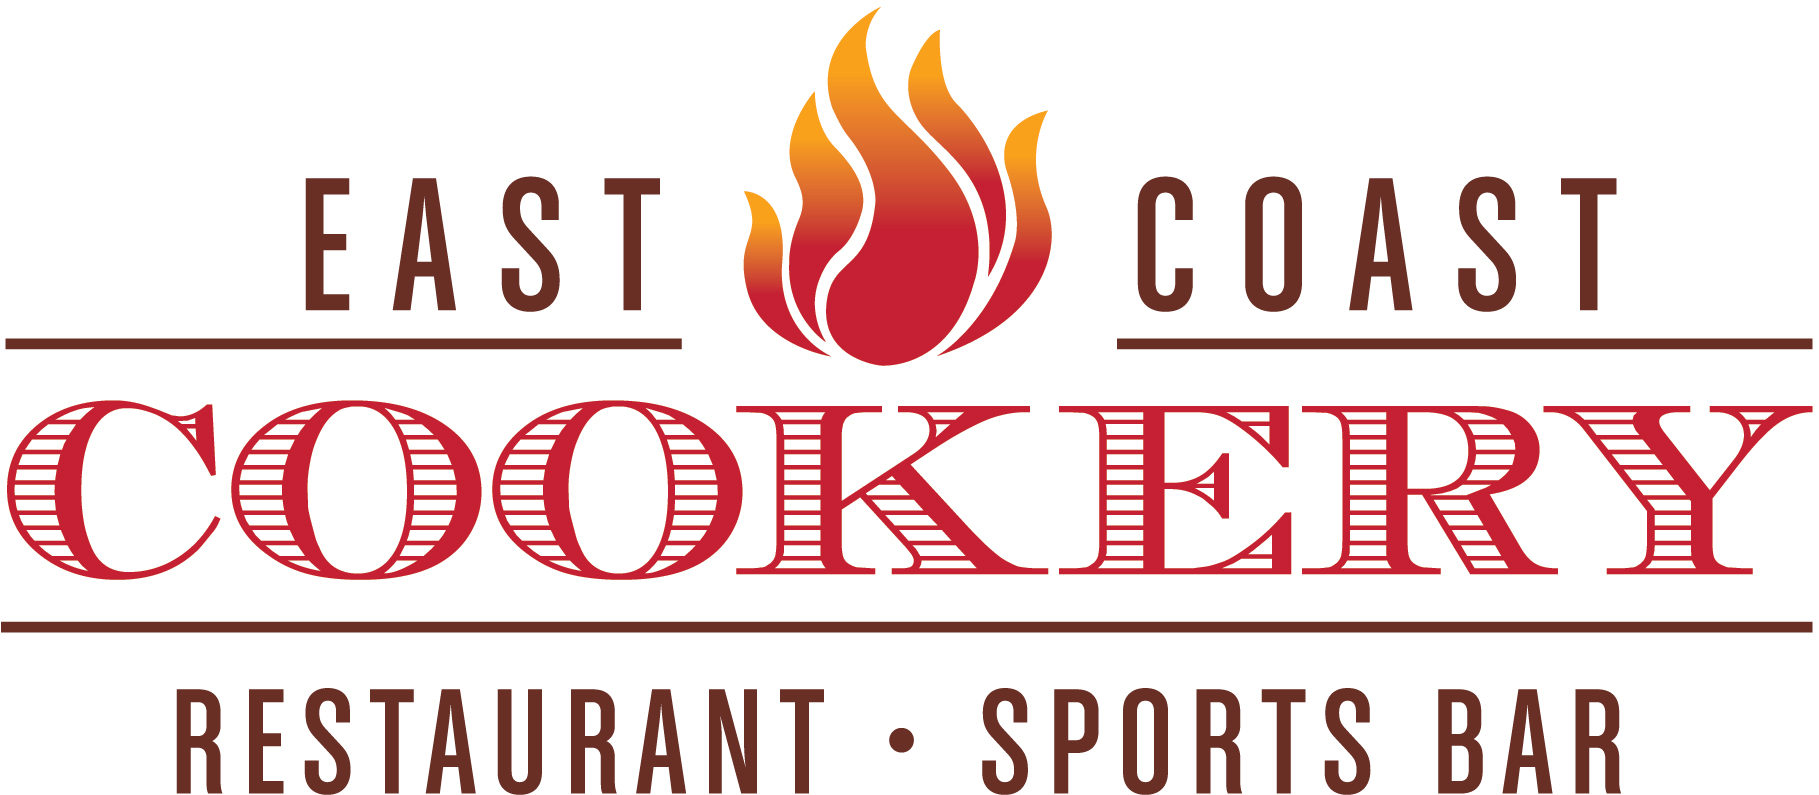 East Coast Cookery